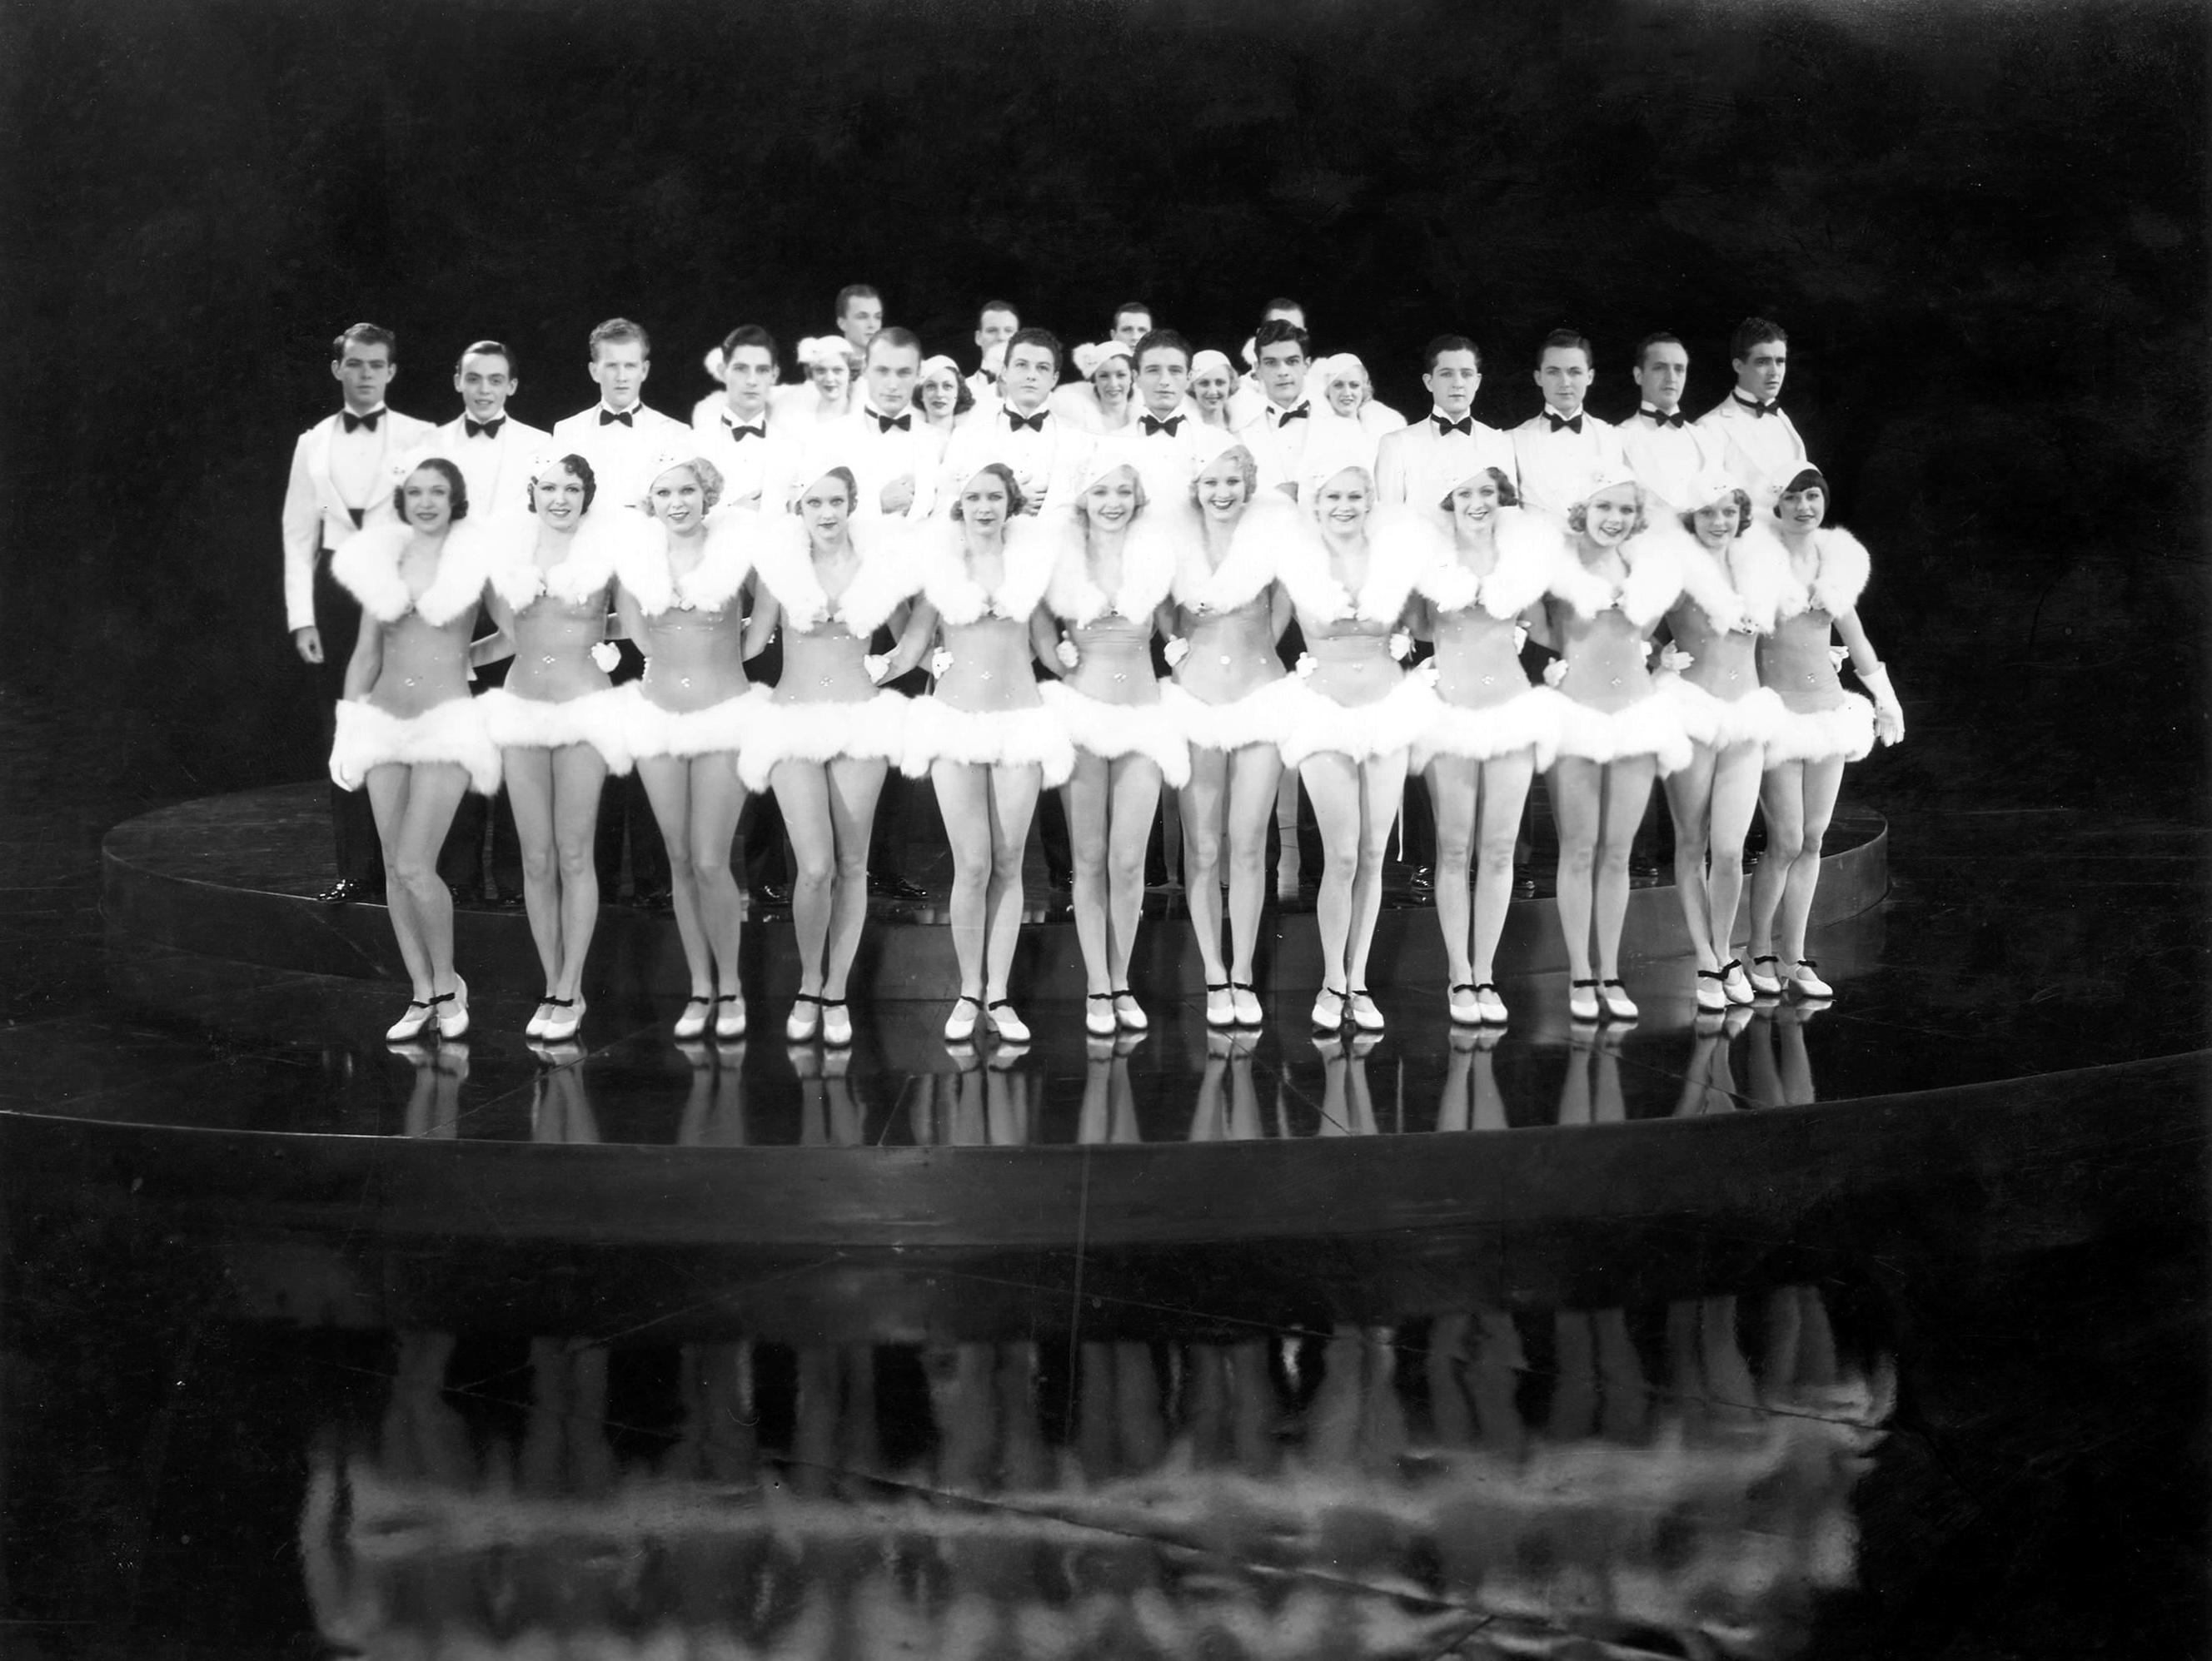 Loretta Andrews, Joan Barclay, Muriel Barrett, Lynn Browning, Edna Callahan, Maxine Cantway, Margaret Carthew, Virginia Dabney, Ruth Eddings, Mildred Dixon, Marie Arbuckle, and Azelie Cecil in 42nd Street (1933)